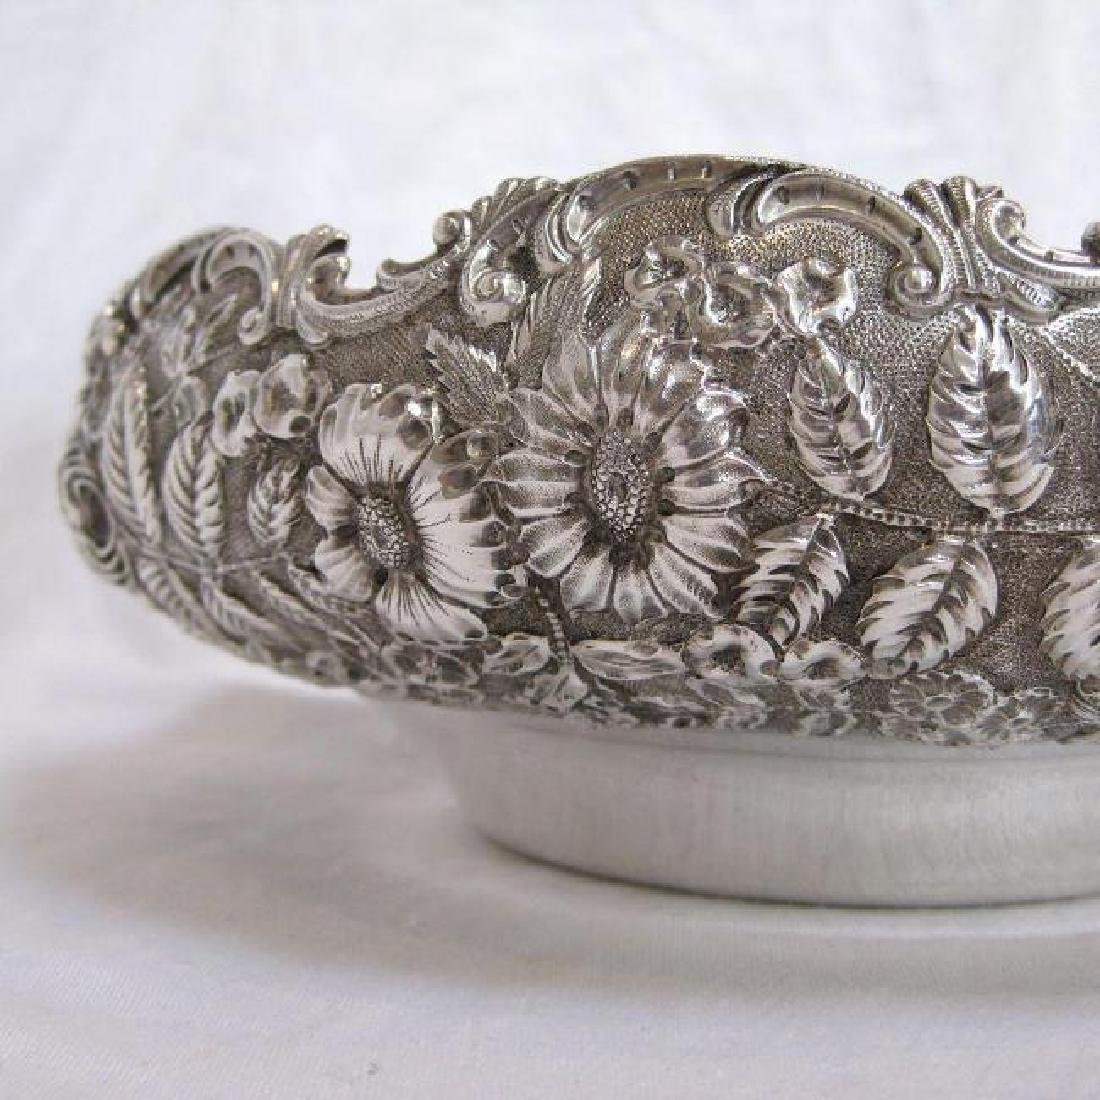 Antique Kirk & Son Sterling Silver Floral Repousse Bowl - 3